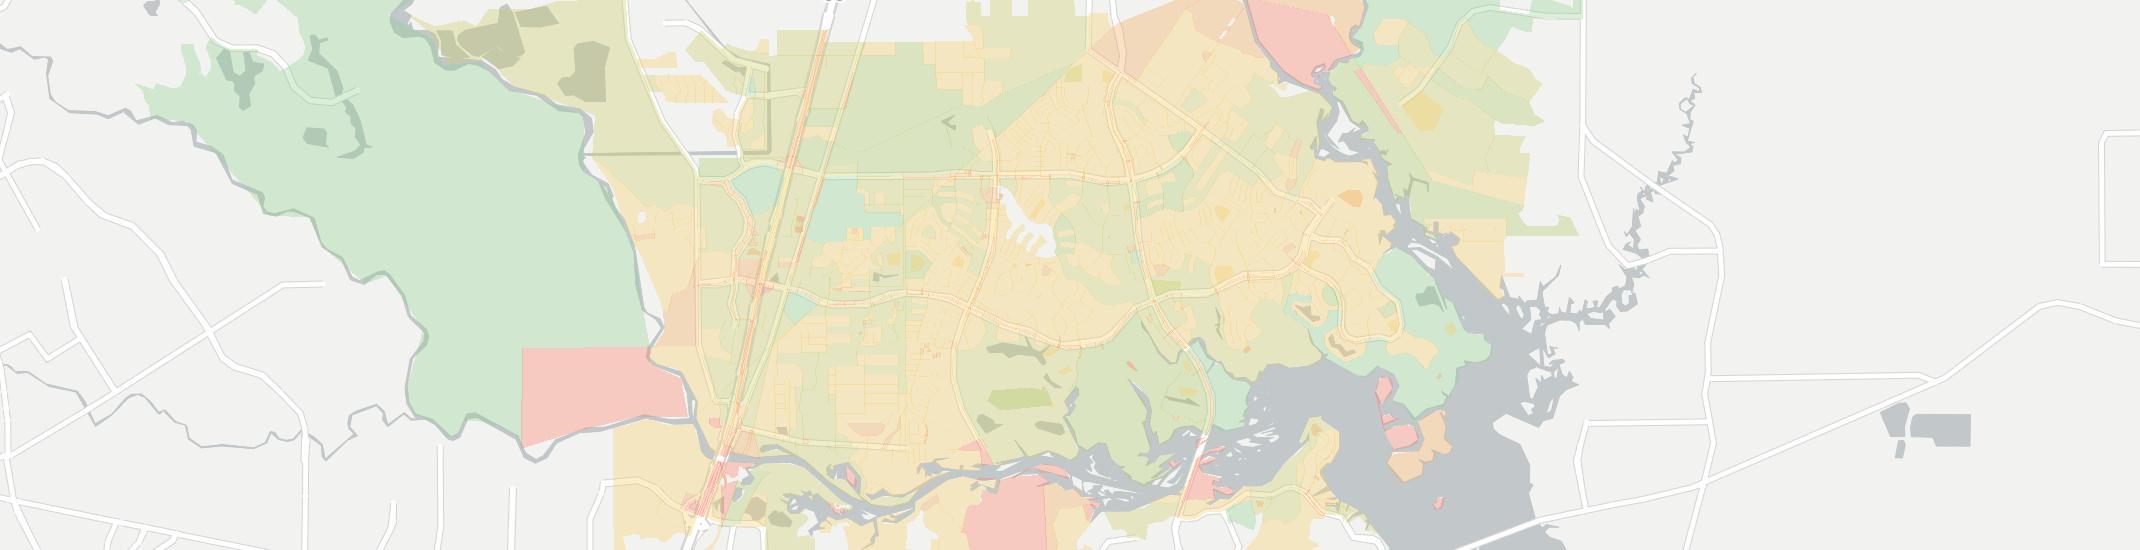 Map Of Kingwood Texas.Kingwood Tx Has 19 Internet Service Providers Broadbandnow Com